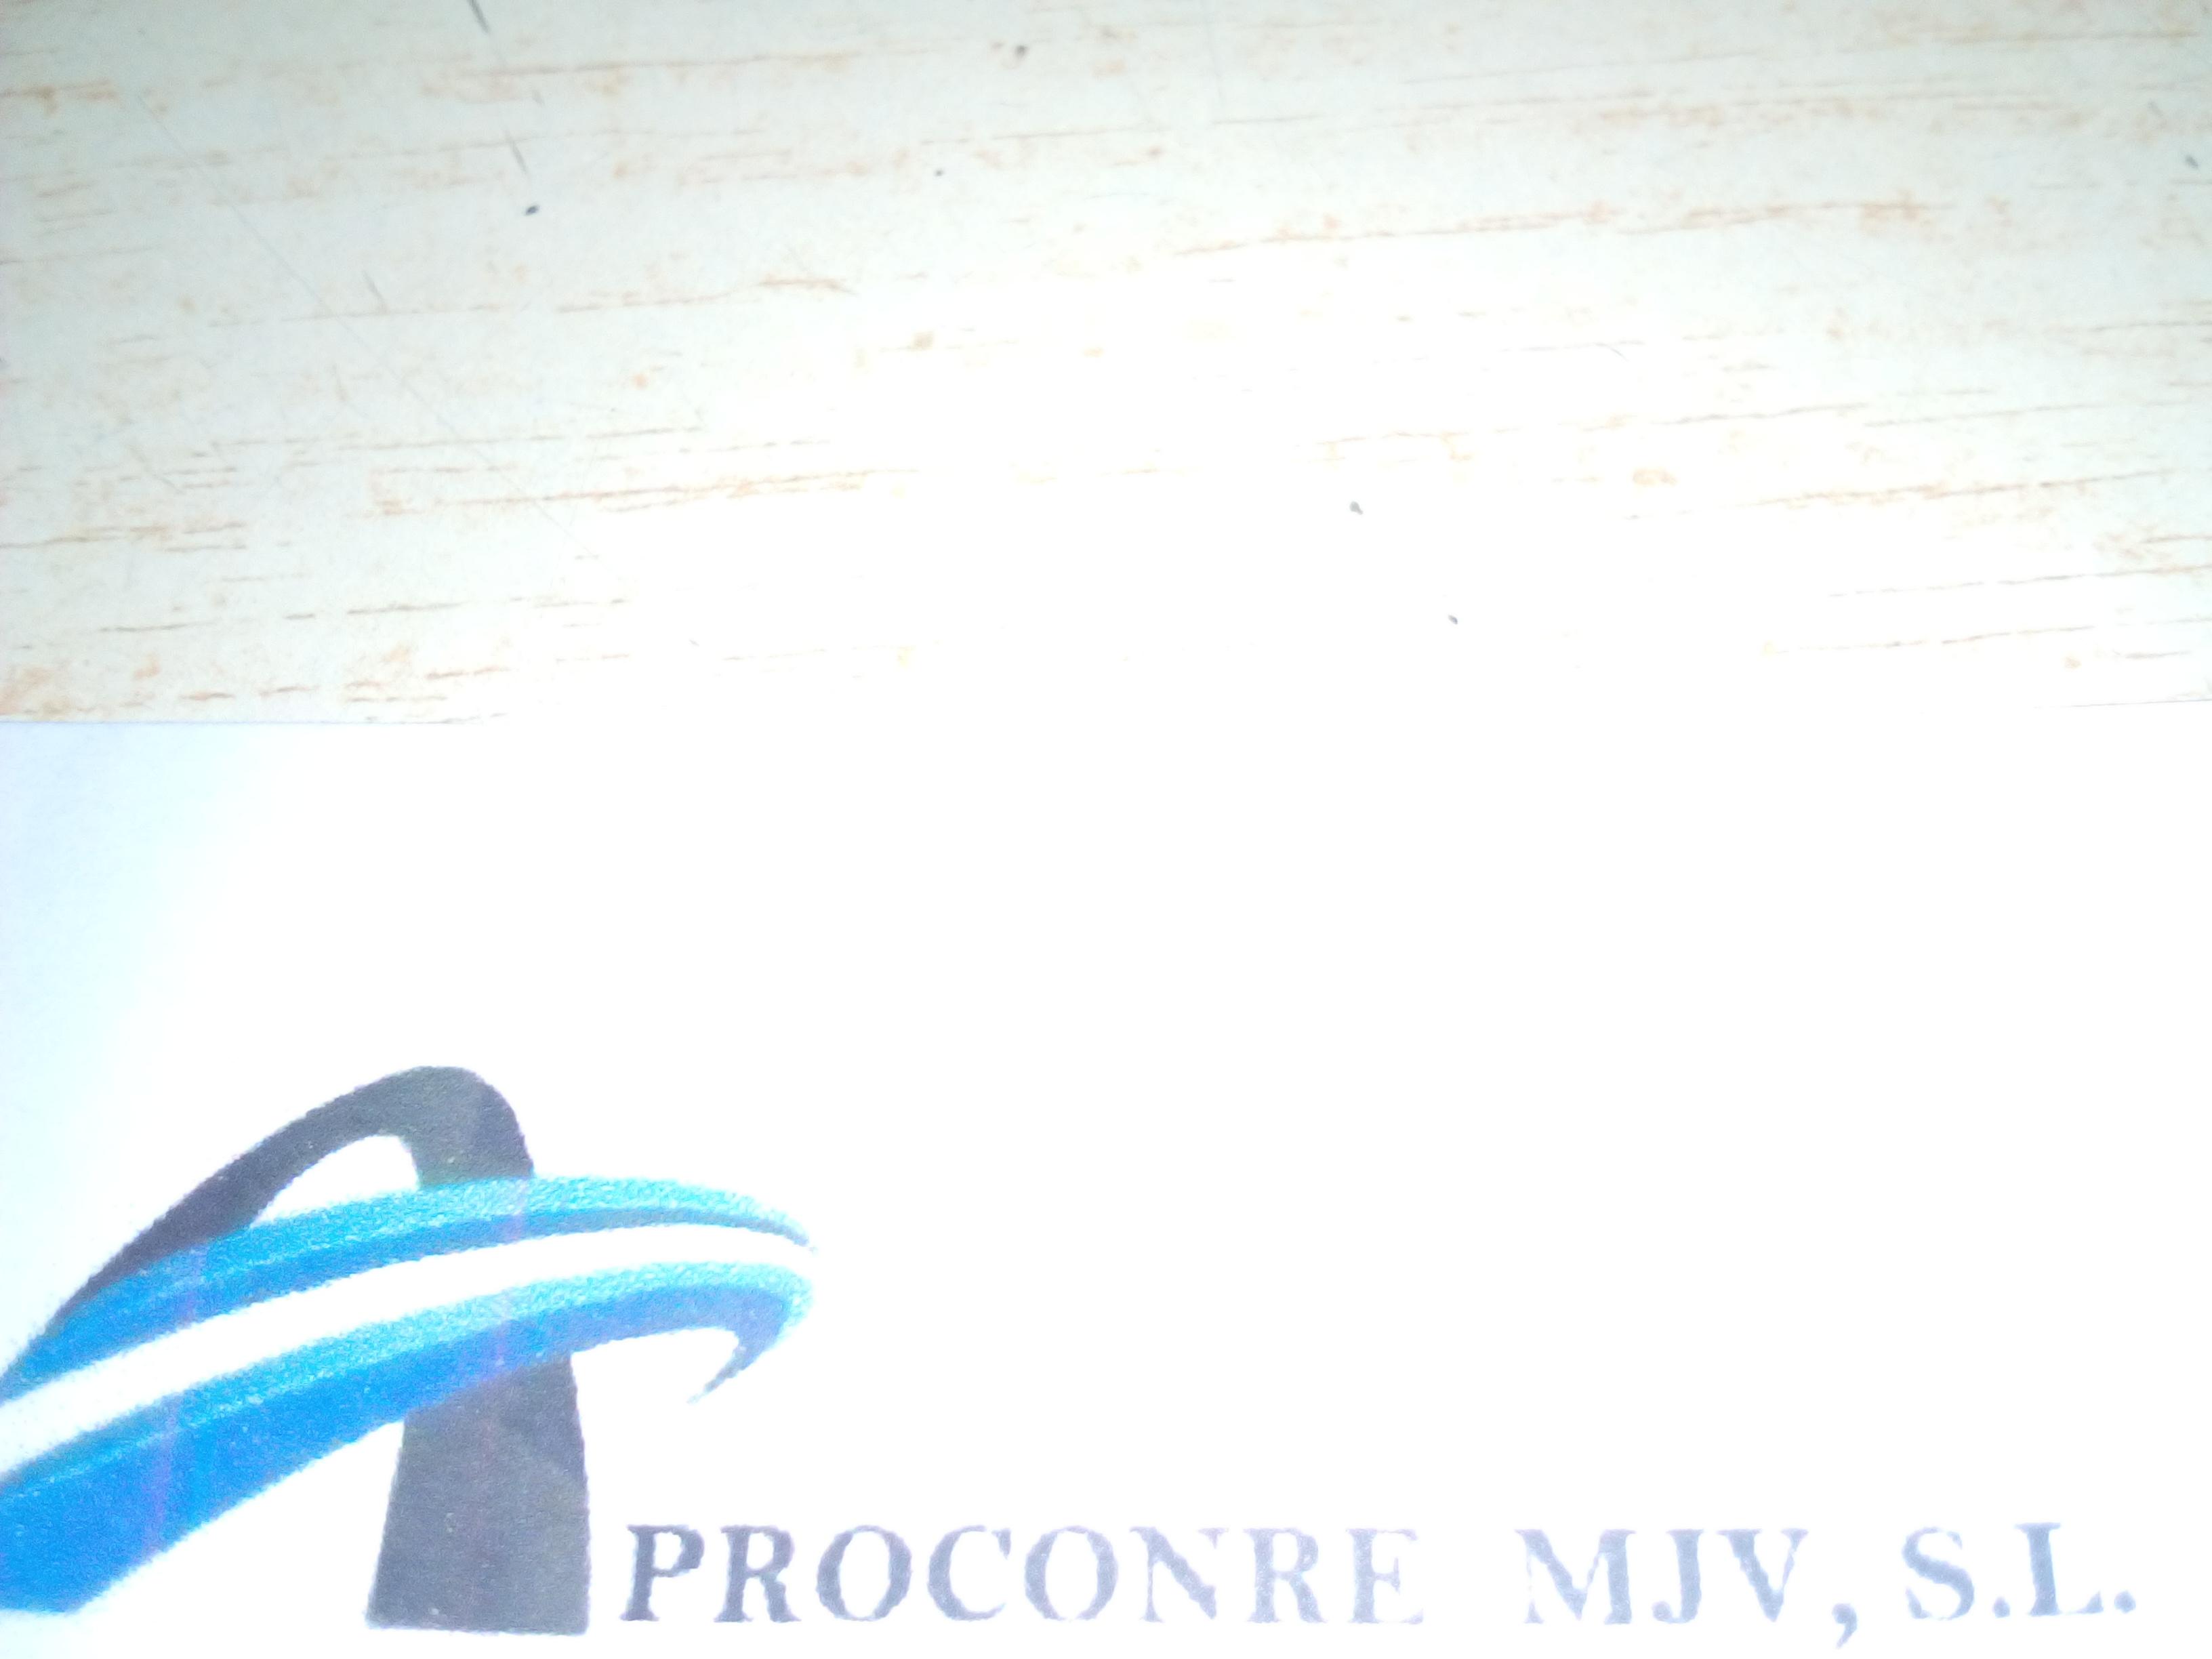 Proconre MJV S.L